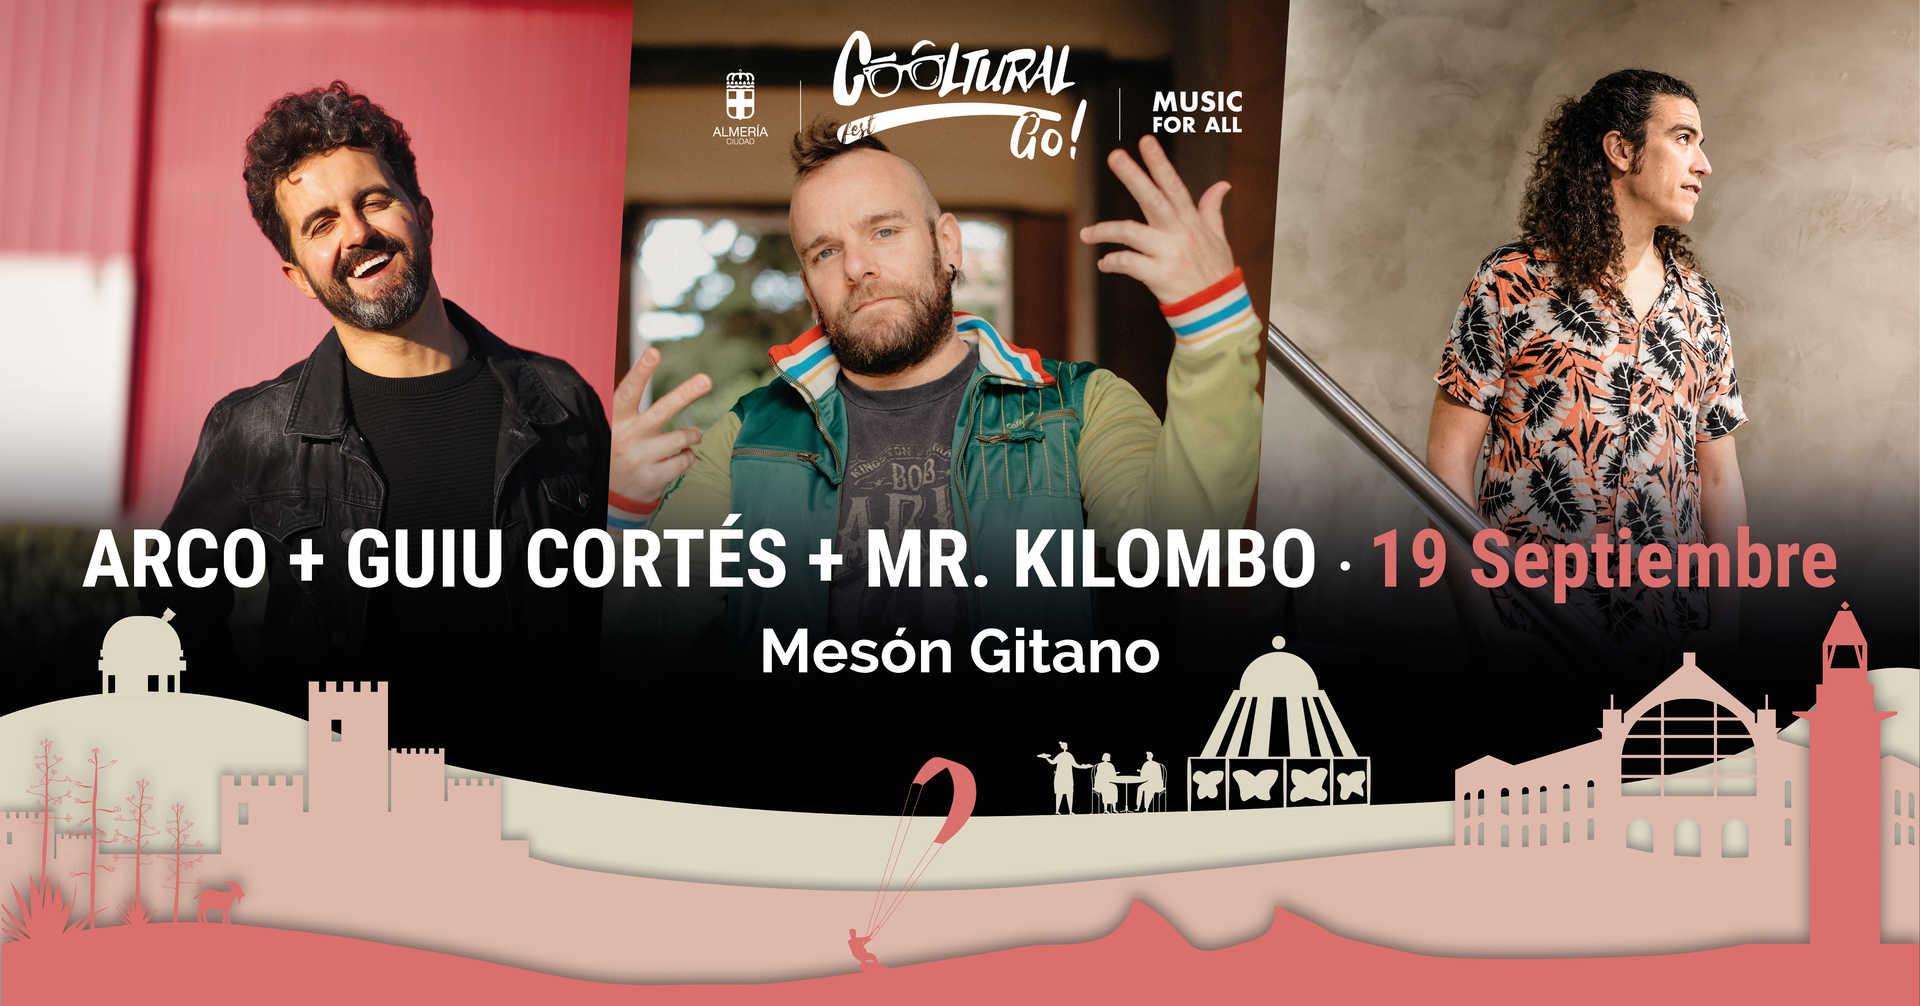 Arco, Mr. Kilombo y Guiu Cortés